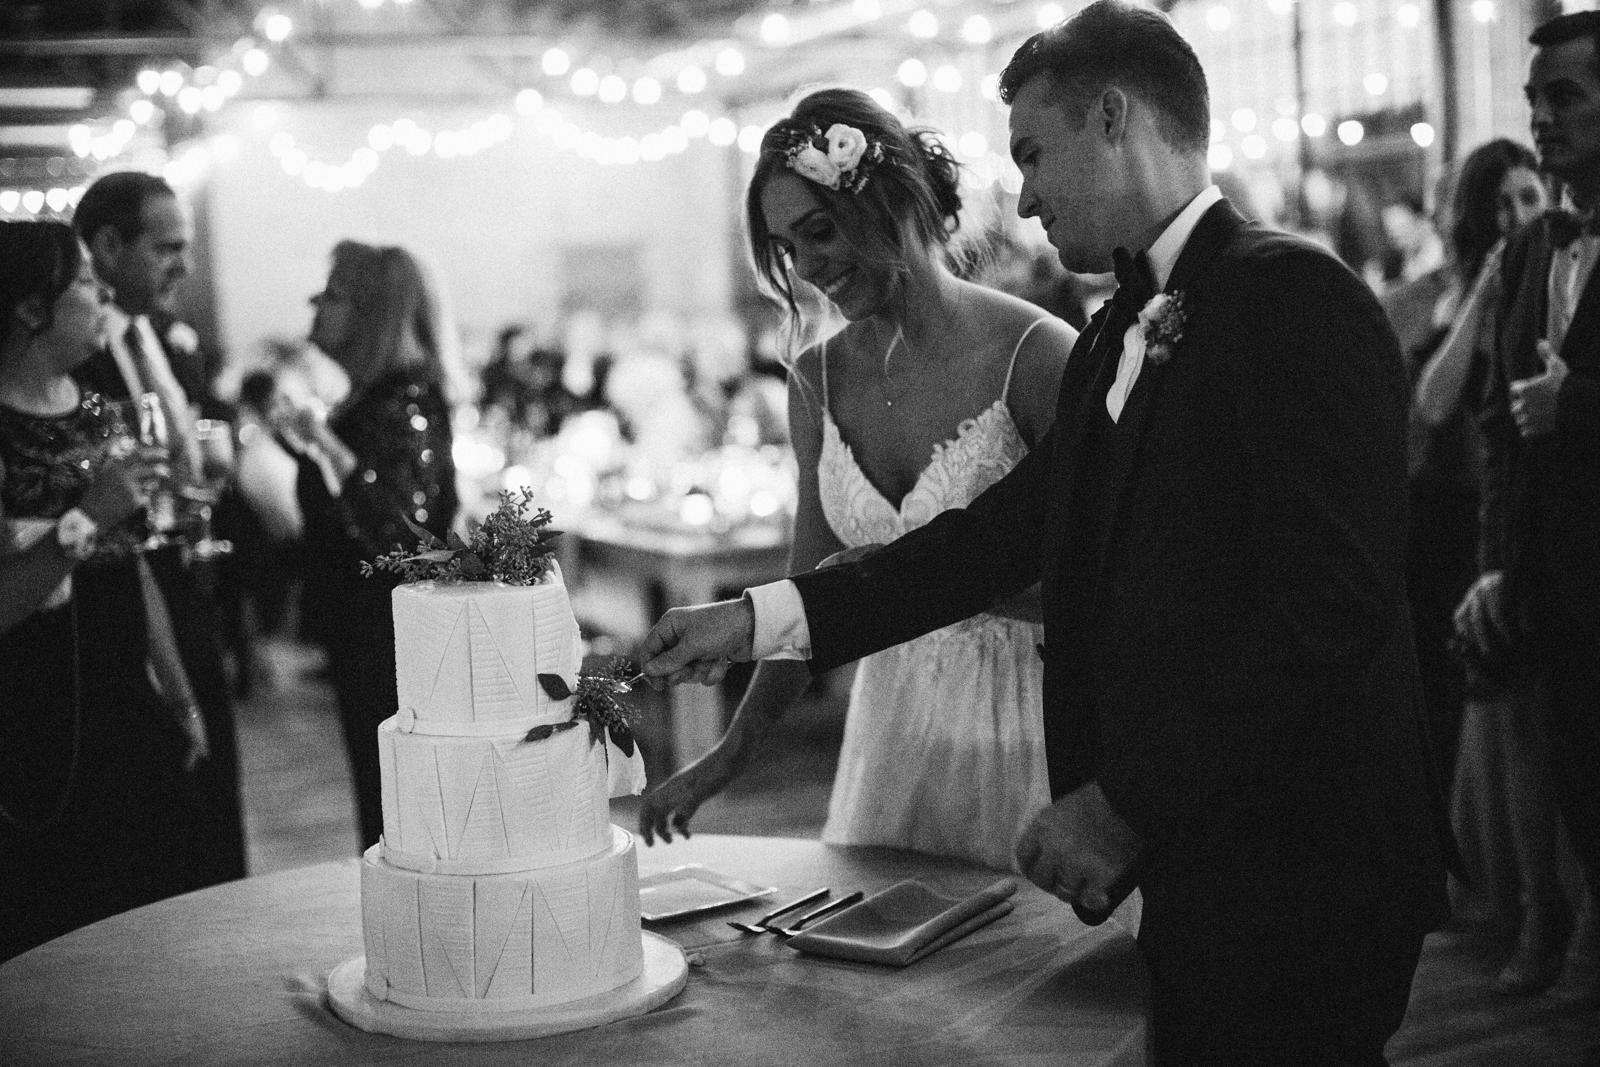 BeanandCole.com-Chris&JackieJohnson-Wedding-269.jpg